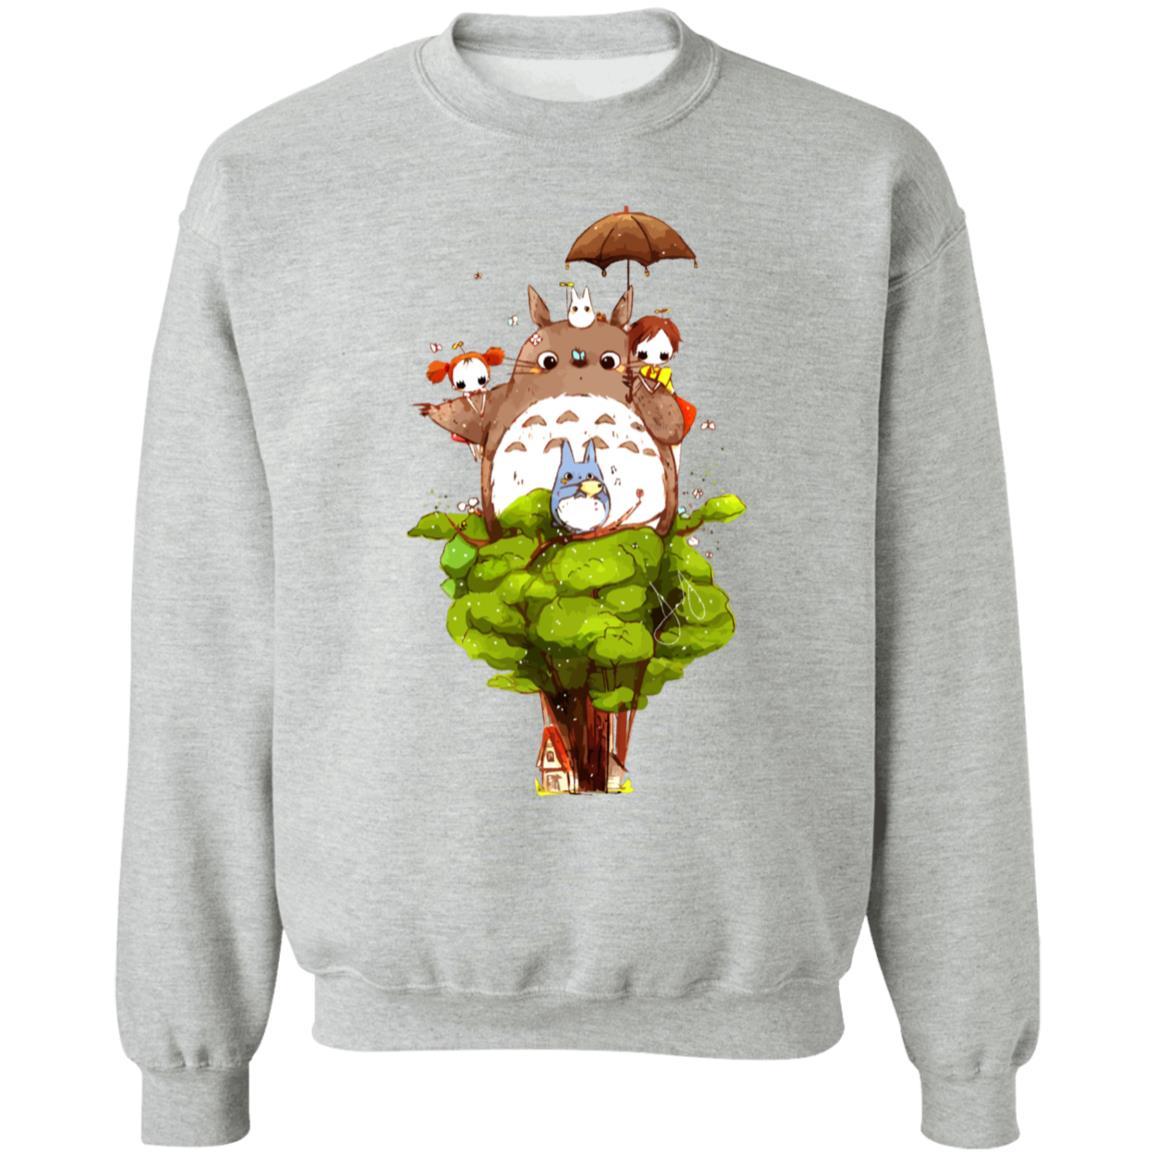 My Neighbor Totoro Characters cartoon Style Sweatshirt